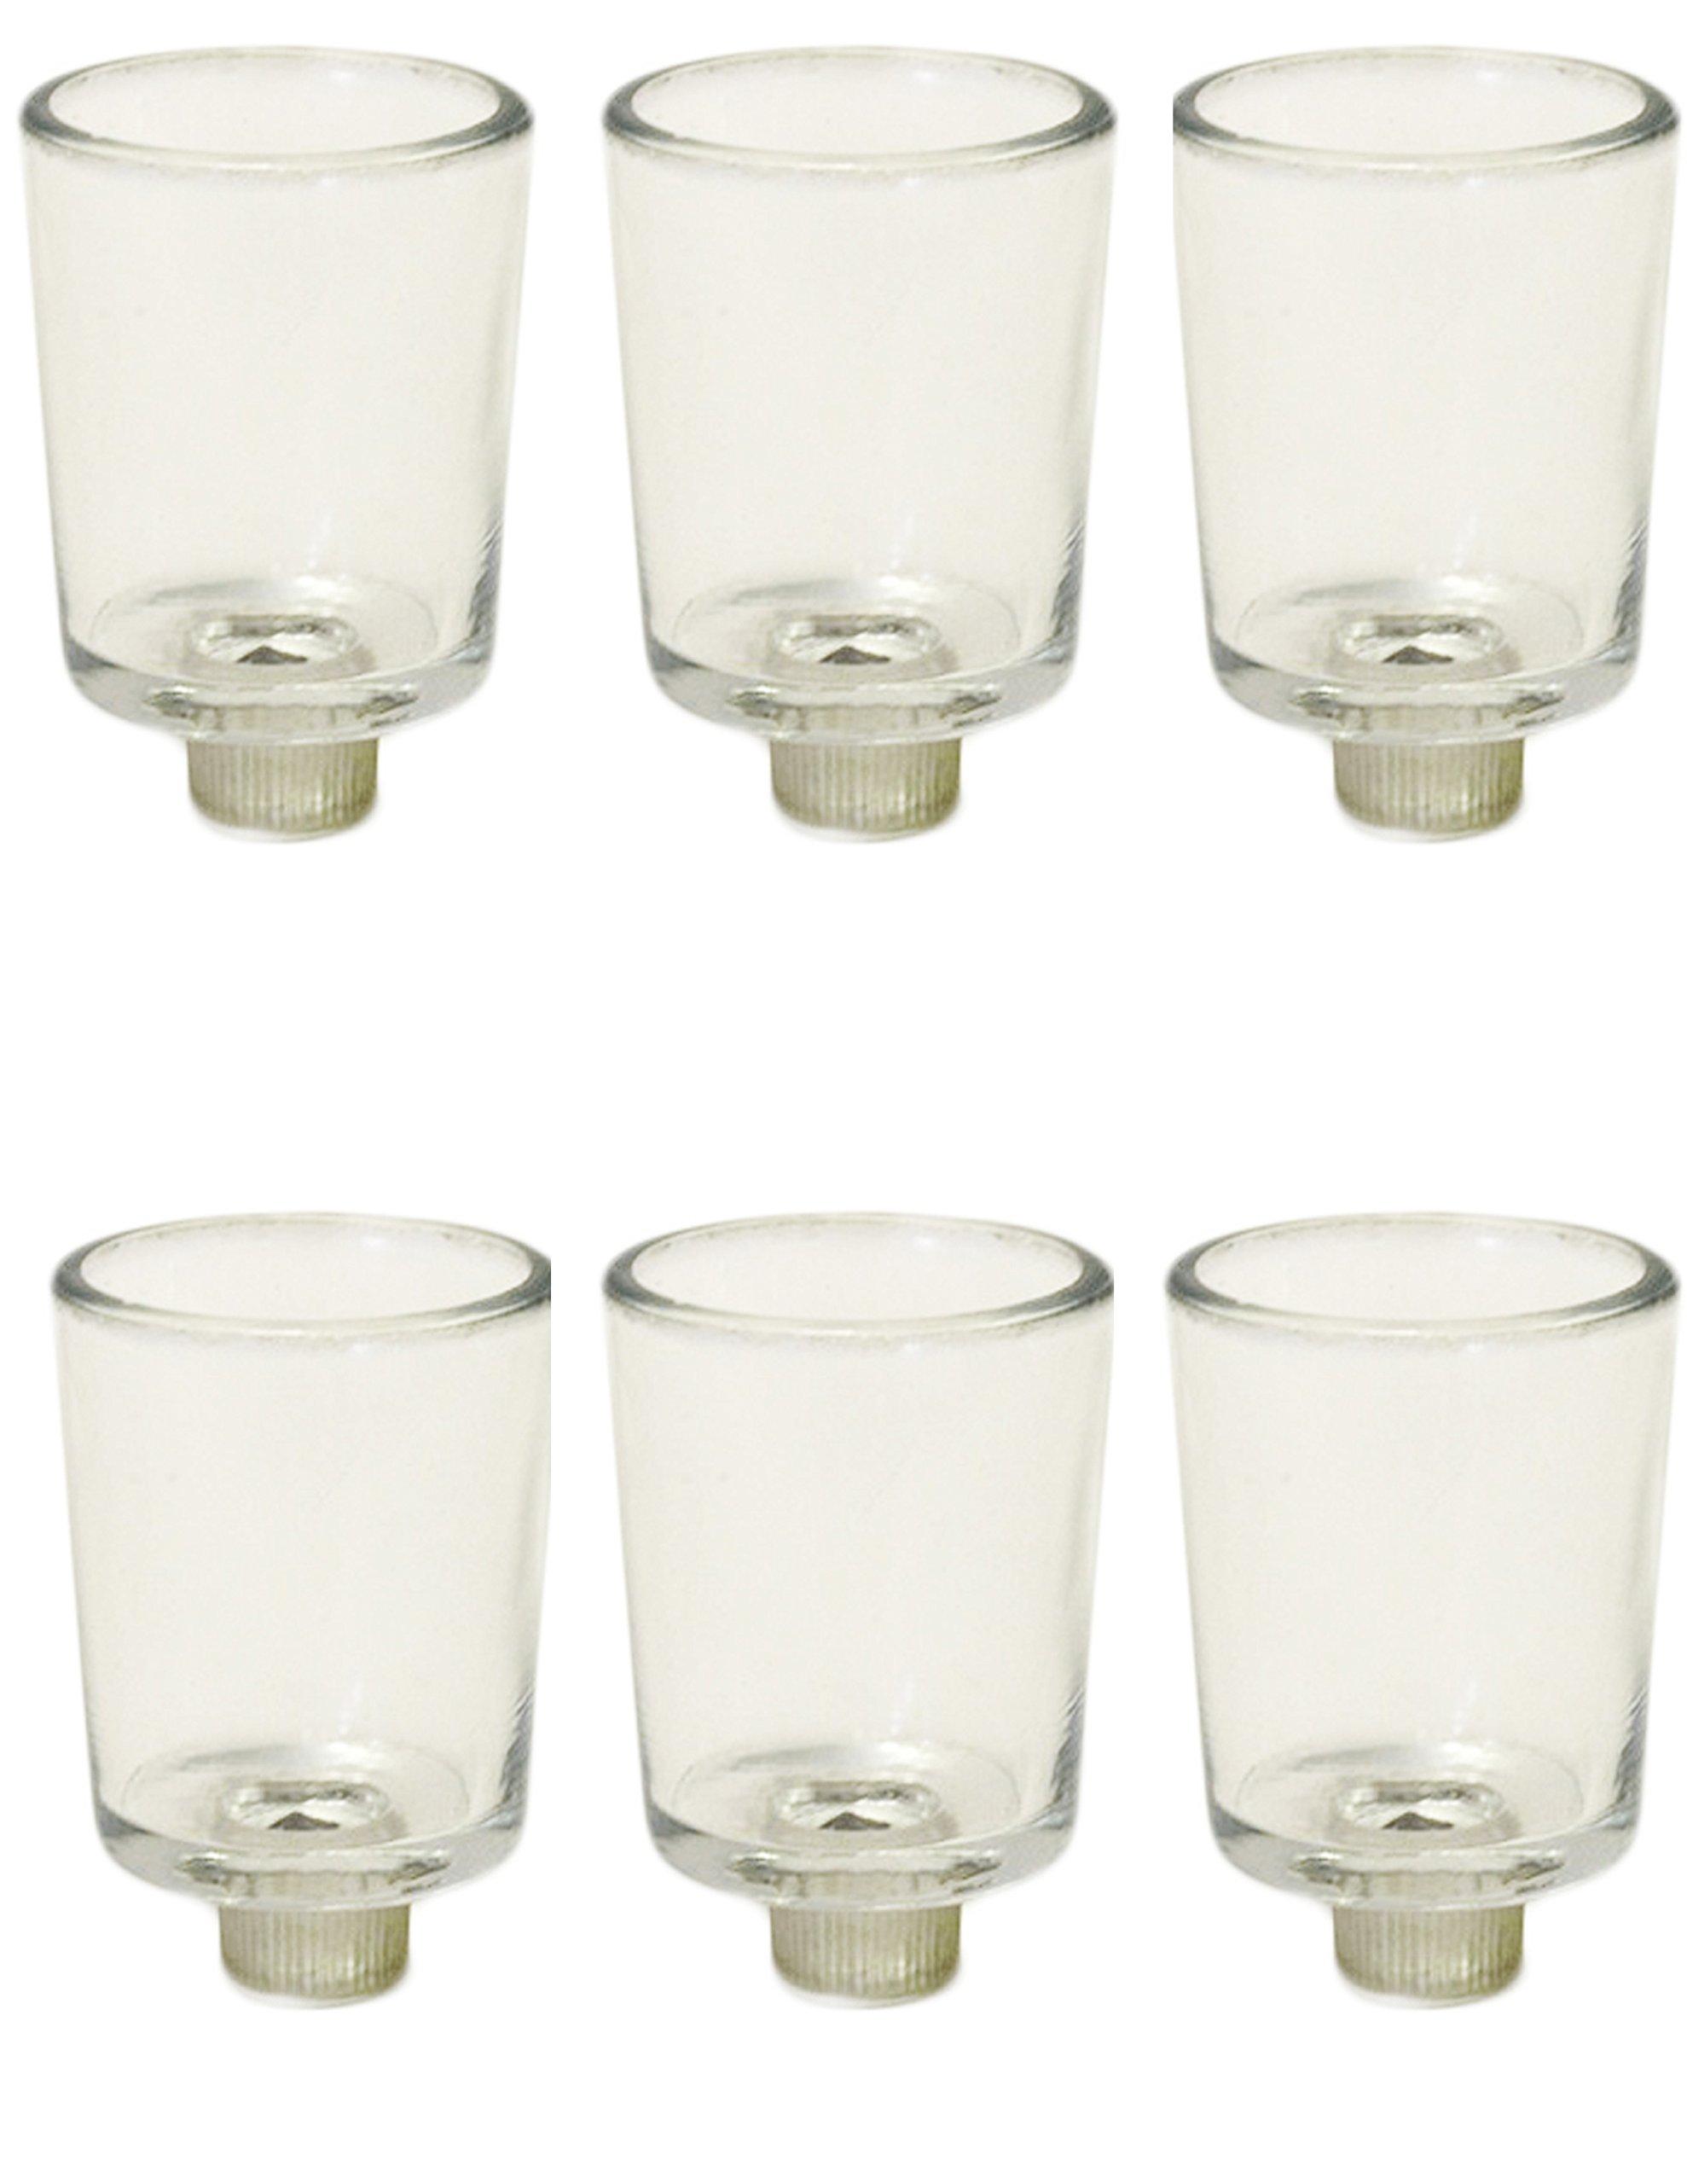 144 Clear Glass Votive Tea Light Holder With peg Bottoms Ima Brass